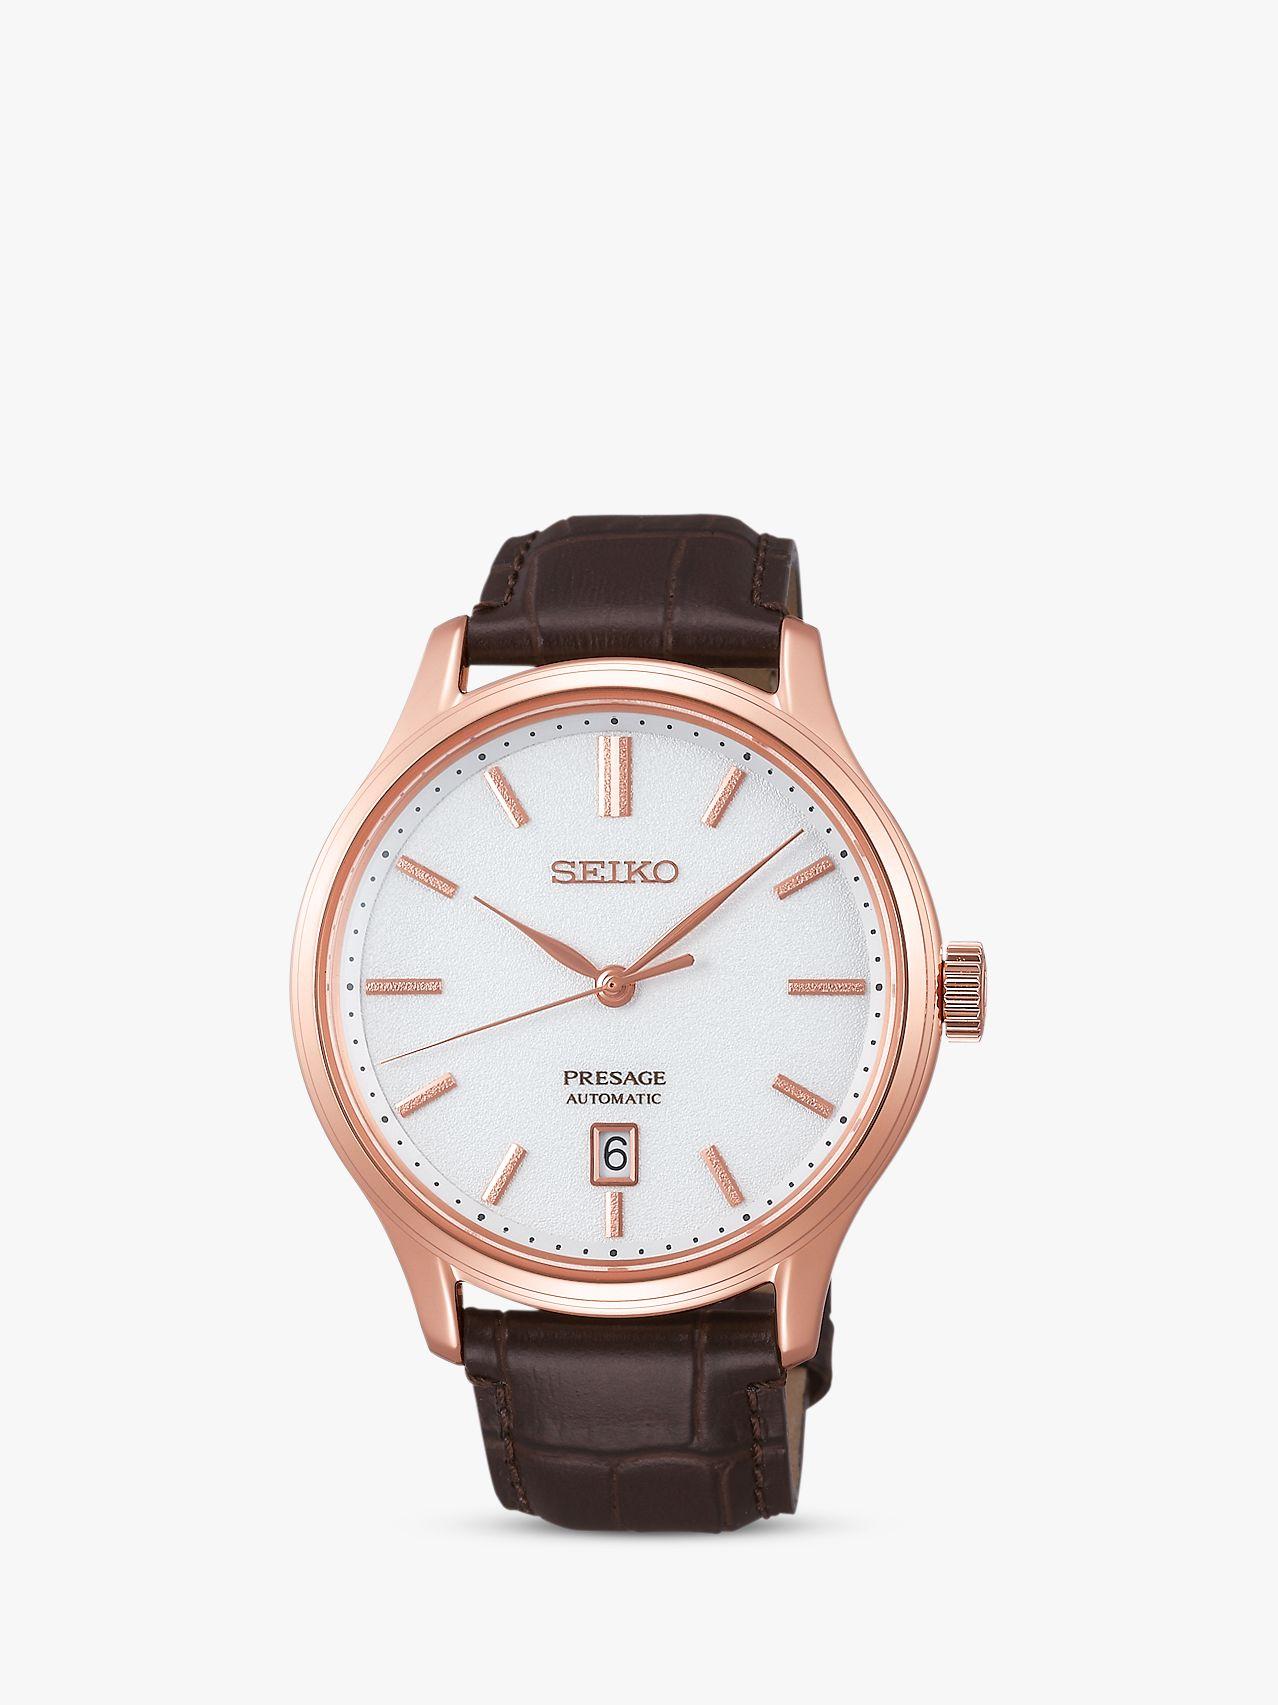 Seiko Seiko SRPD42J1 Men's Presage Automatic Date Leather Strap Watch, Brown/White